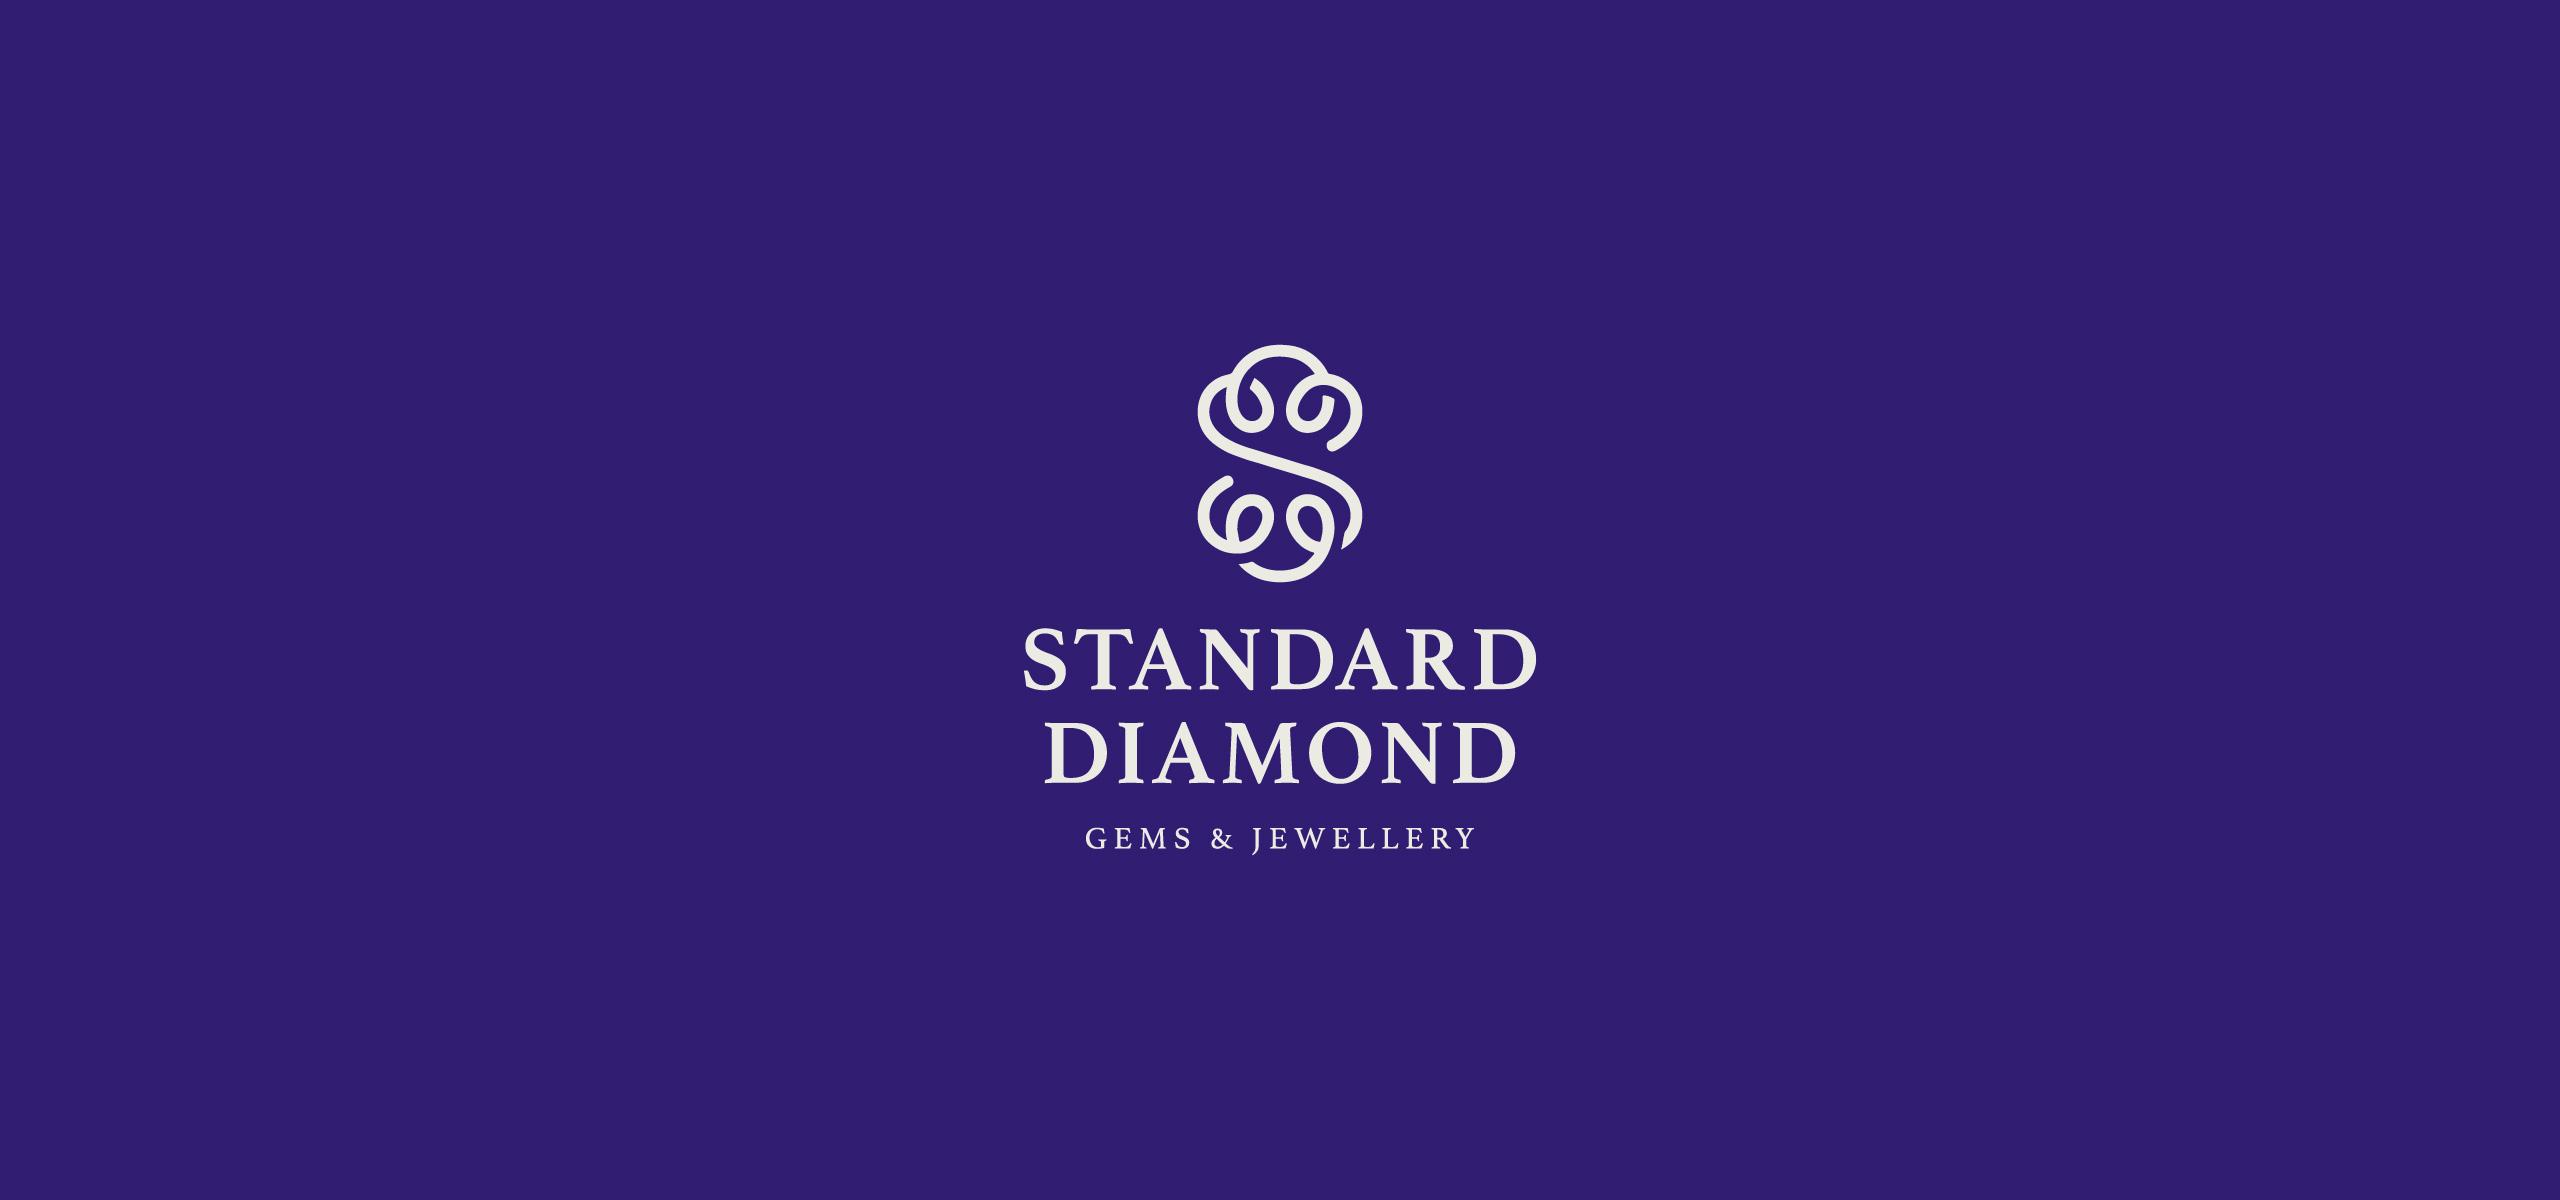 Logo for Gems & Jewellery Company in Bangkok. Jewelry Company Brand Logo.